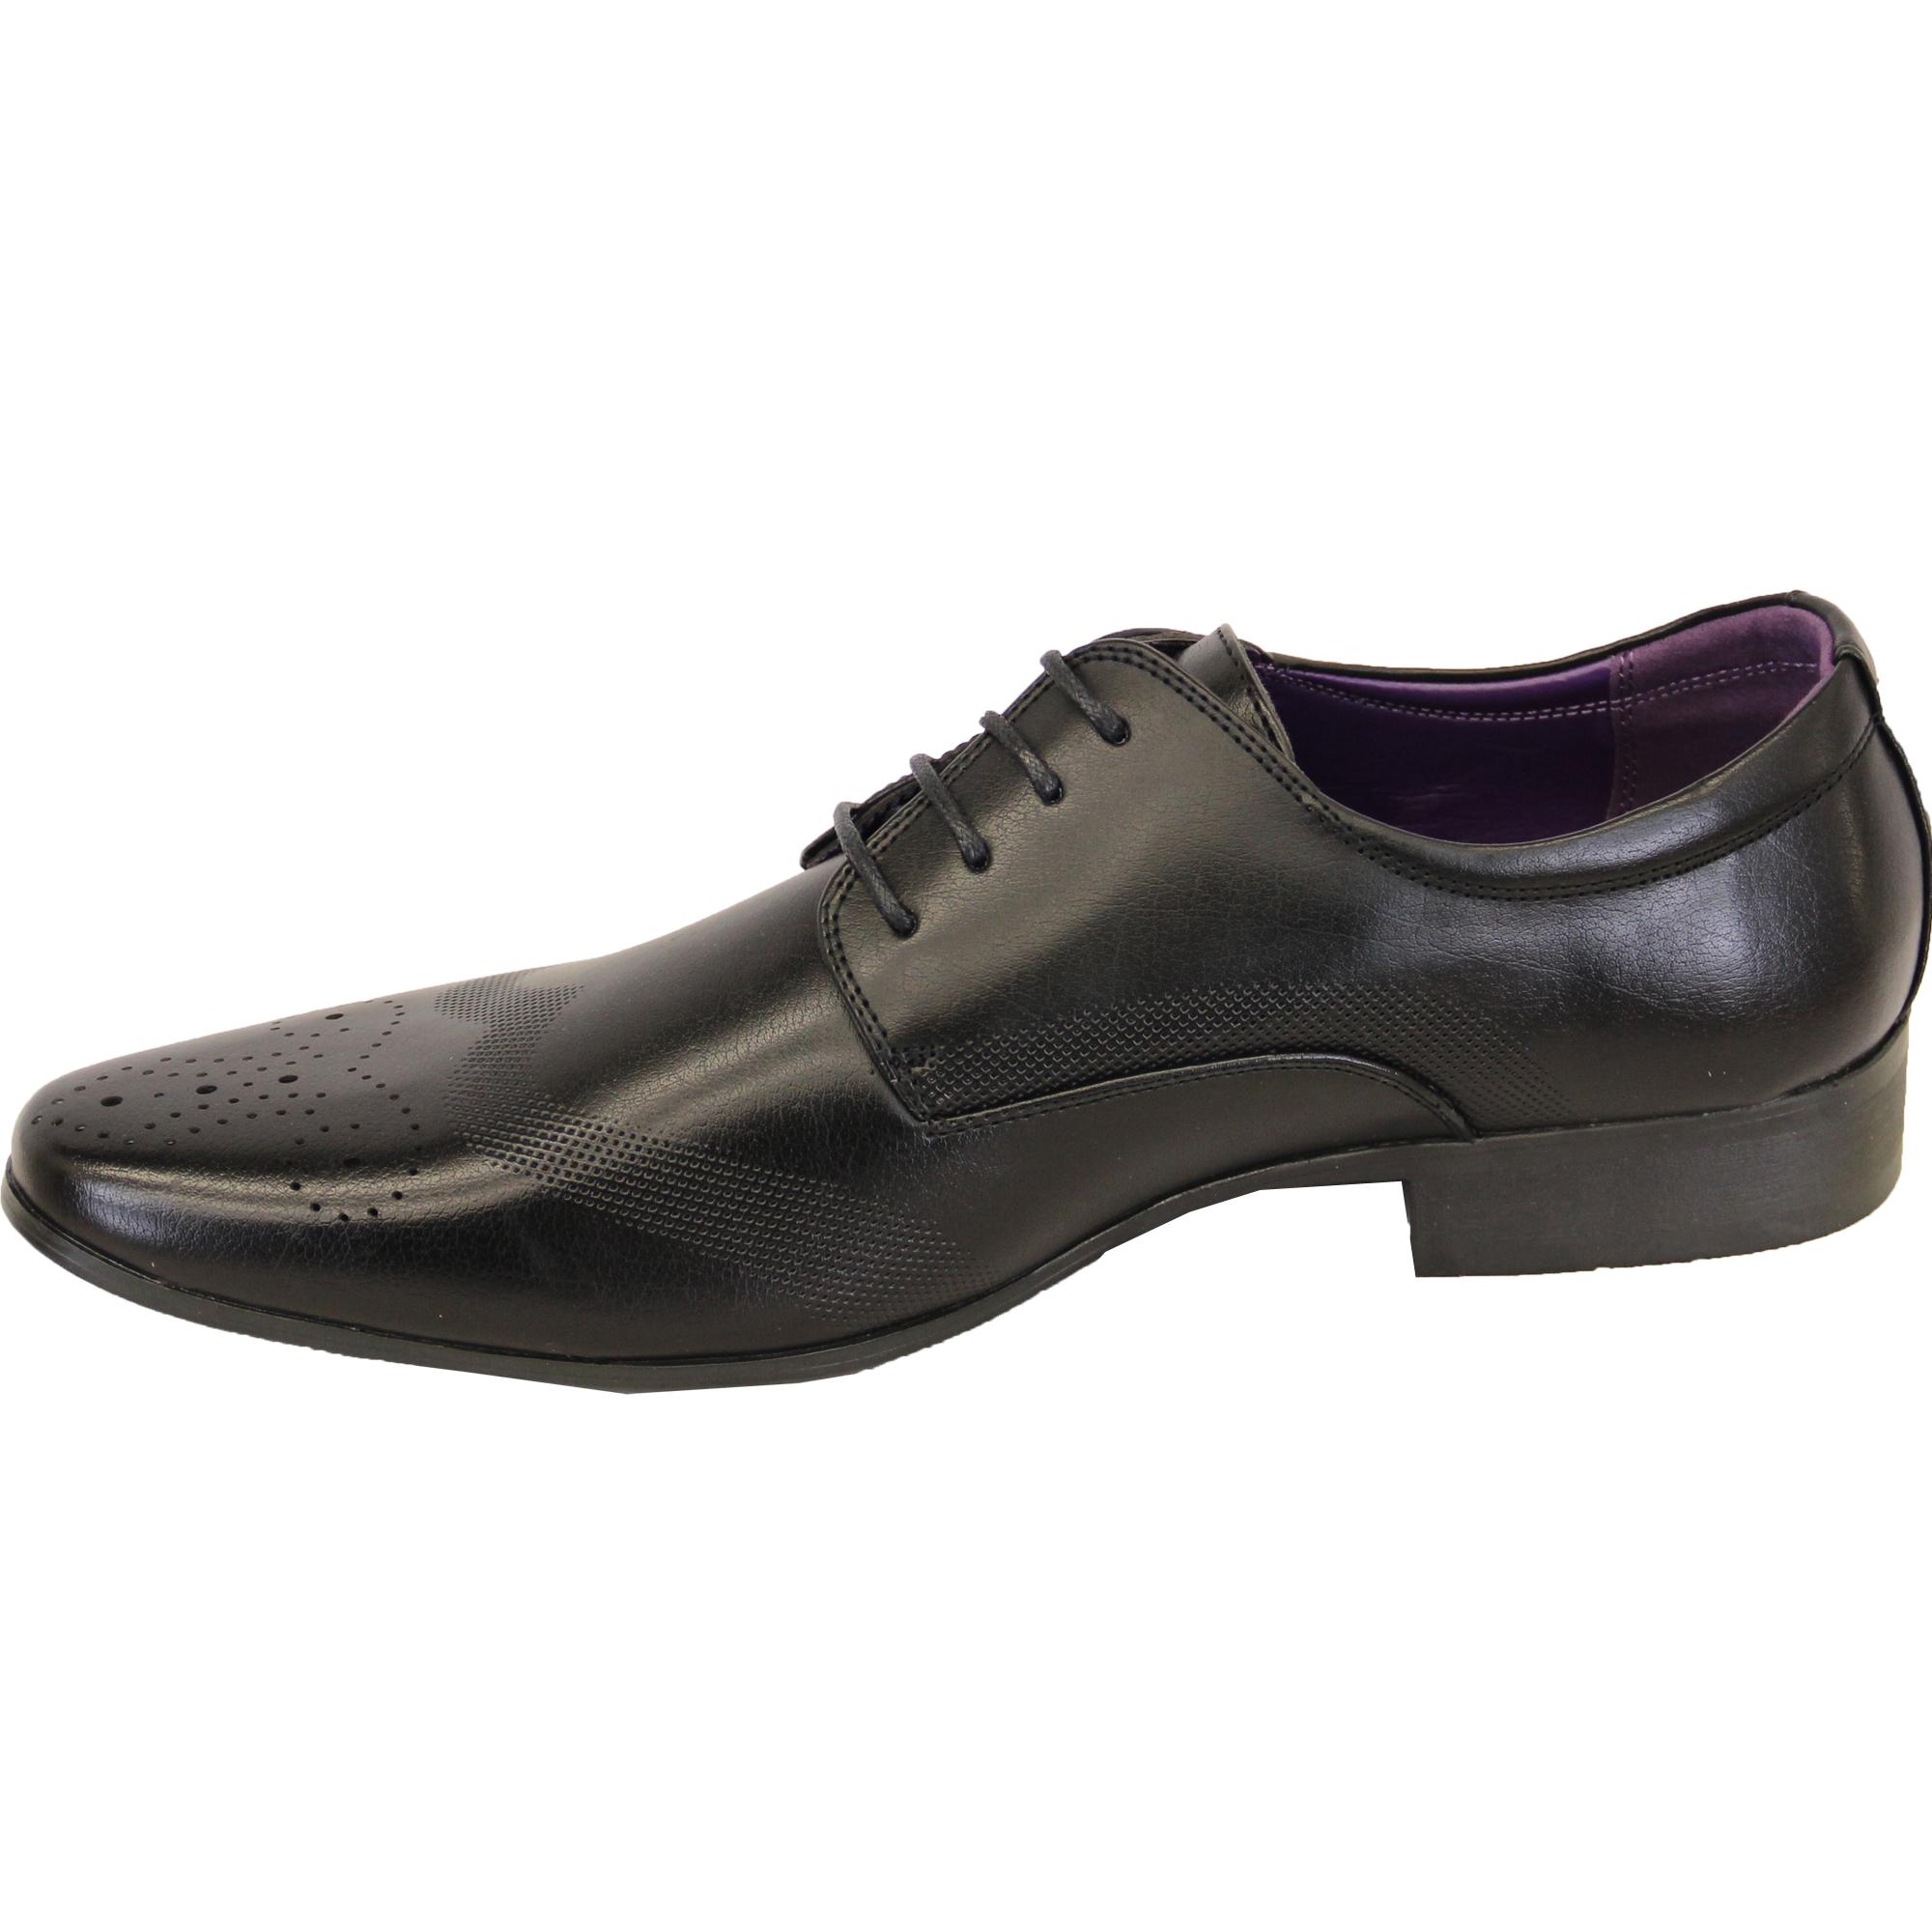 Italian Formal Shoes Uk